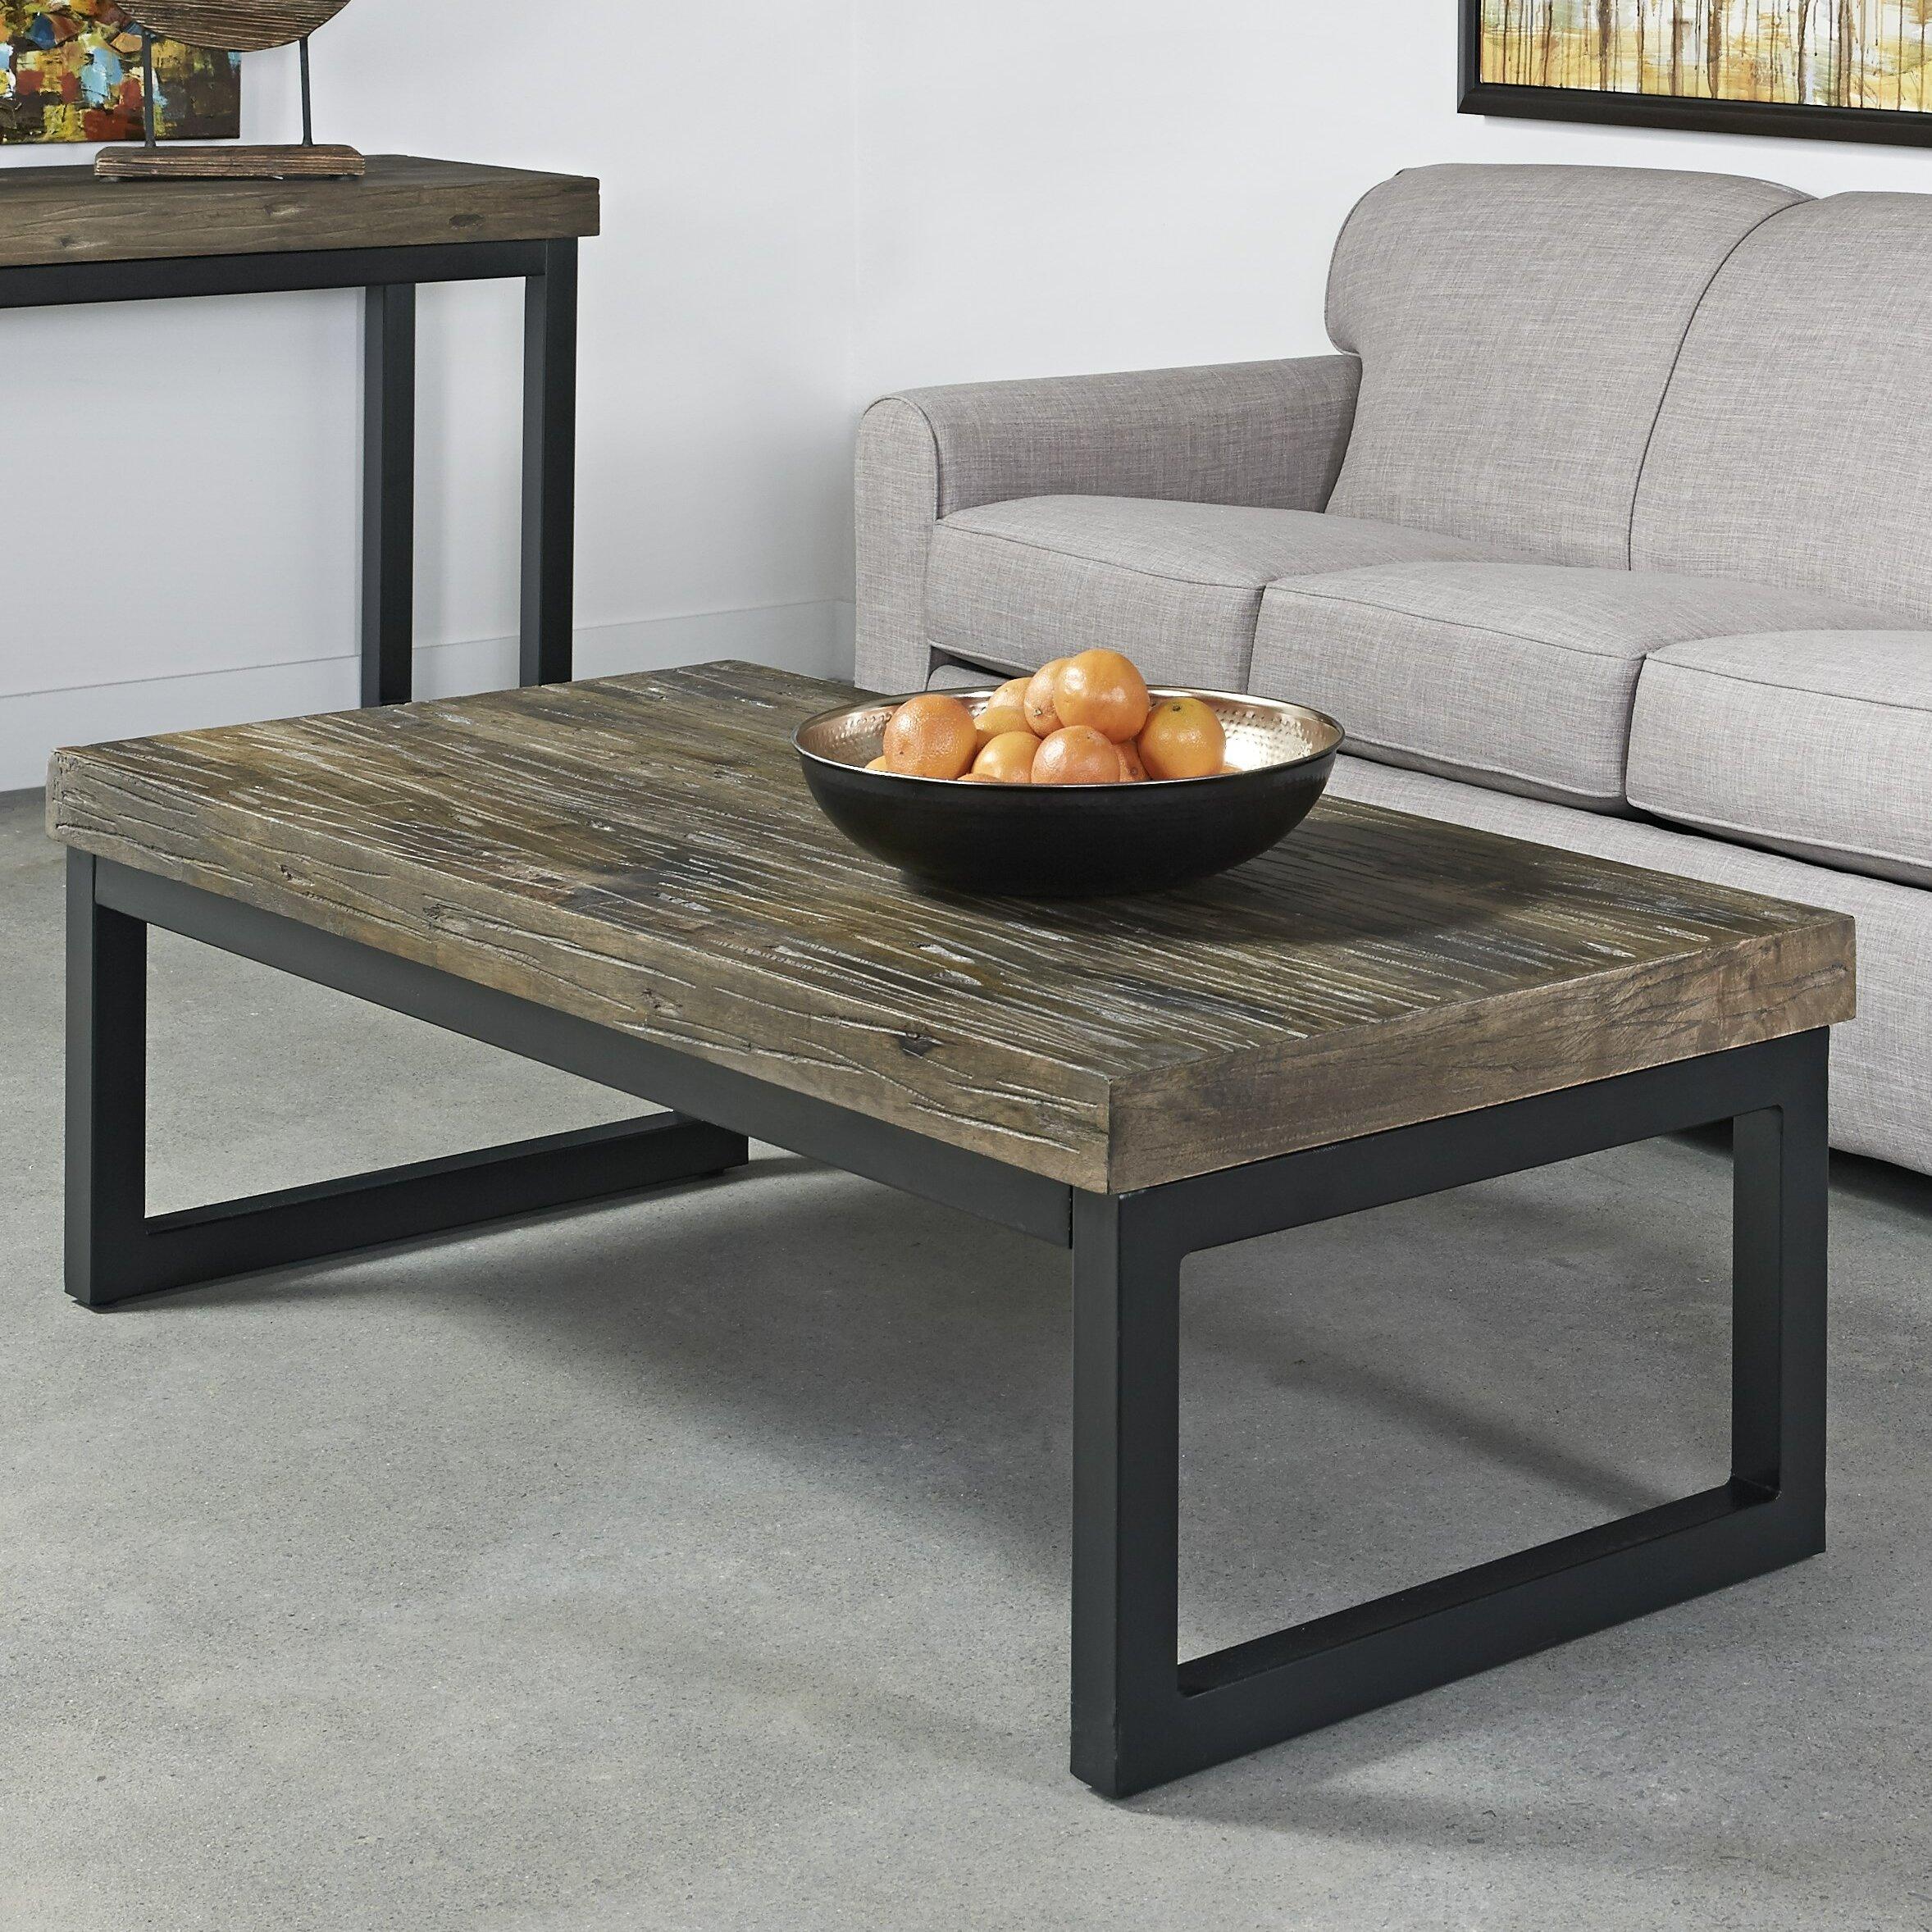 Trent Austin Design Laguna Coffee Table Reviews: Trent Austin Design Winhurst Coffee Table